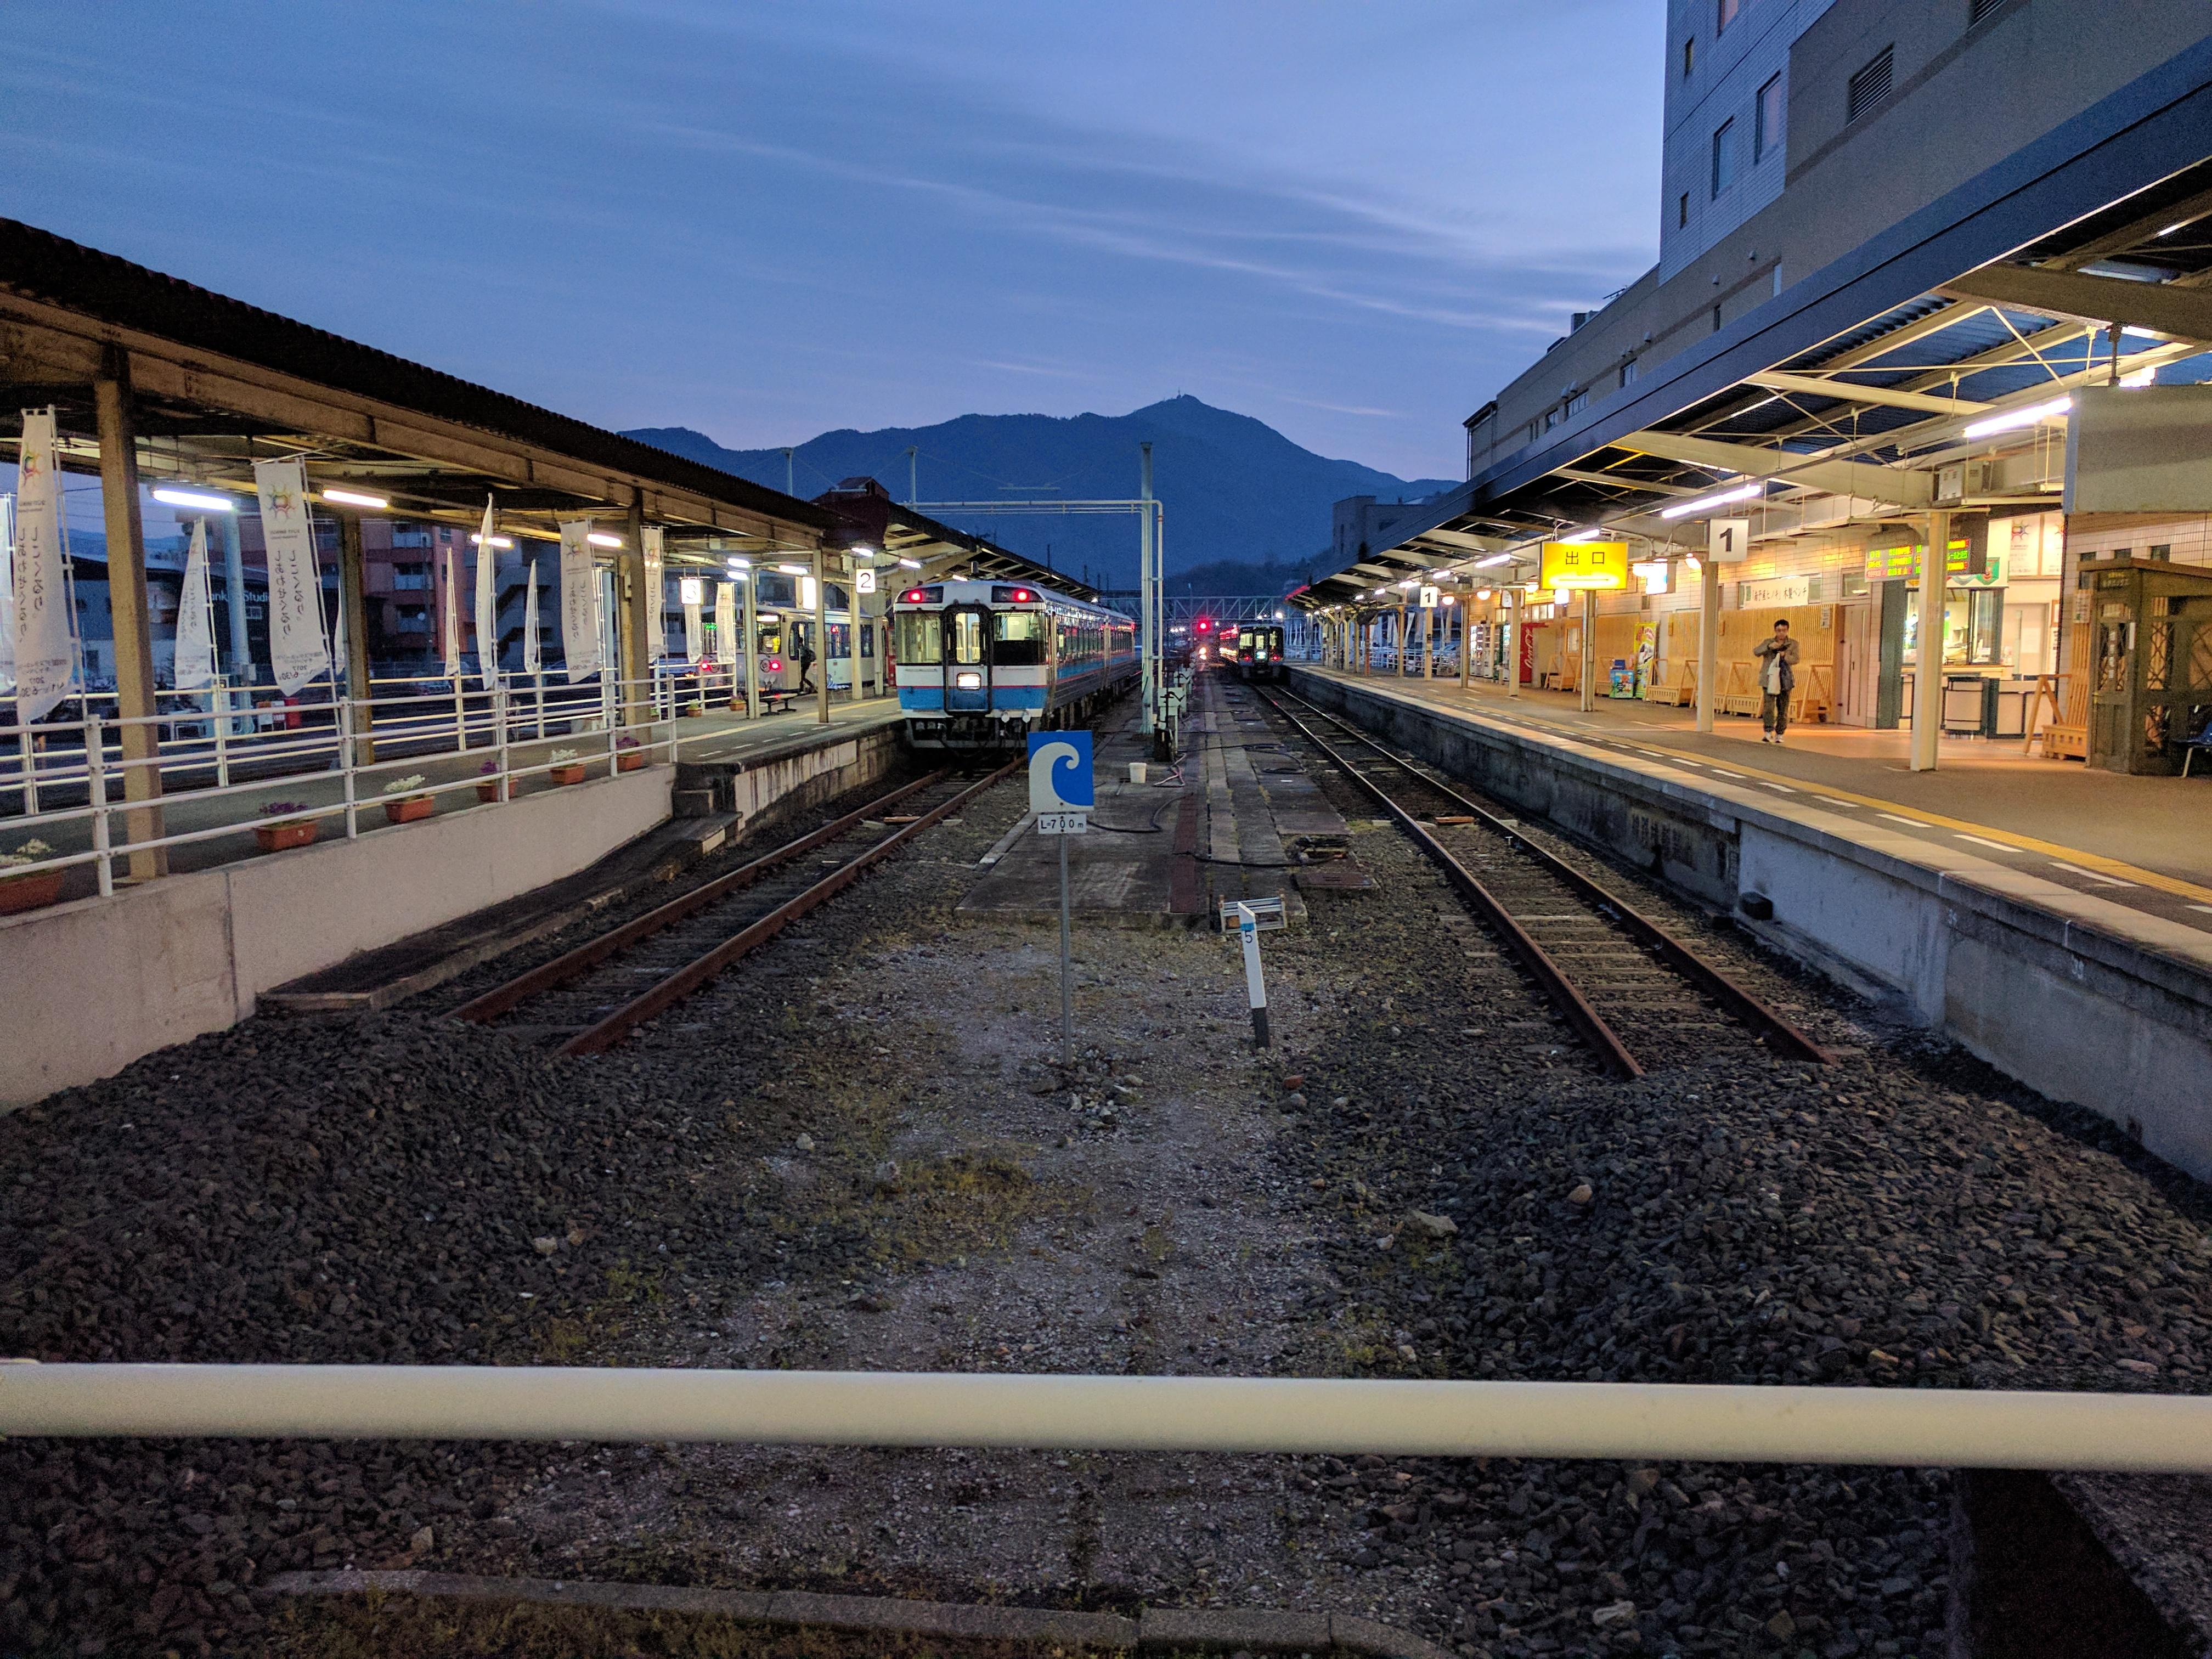 https://upload.wikimedia.org/wikipedia/commons/c/c3/JRS_Uwajima_Station_2017-03-19.jpg